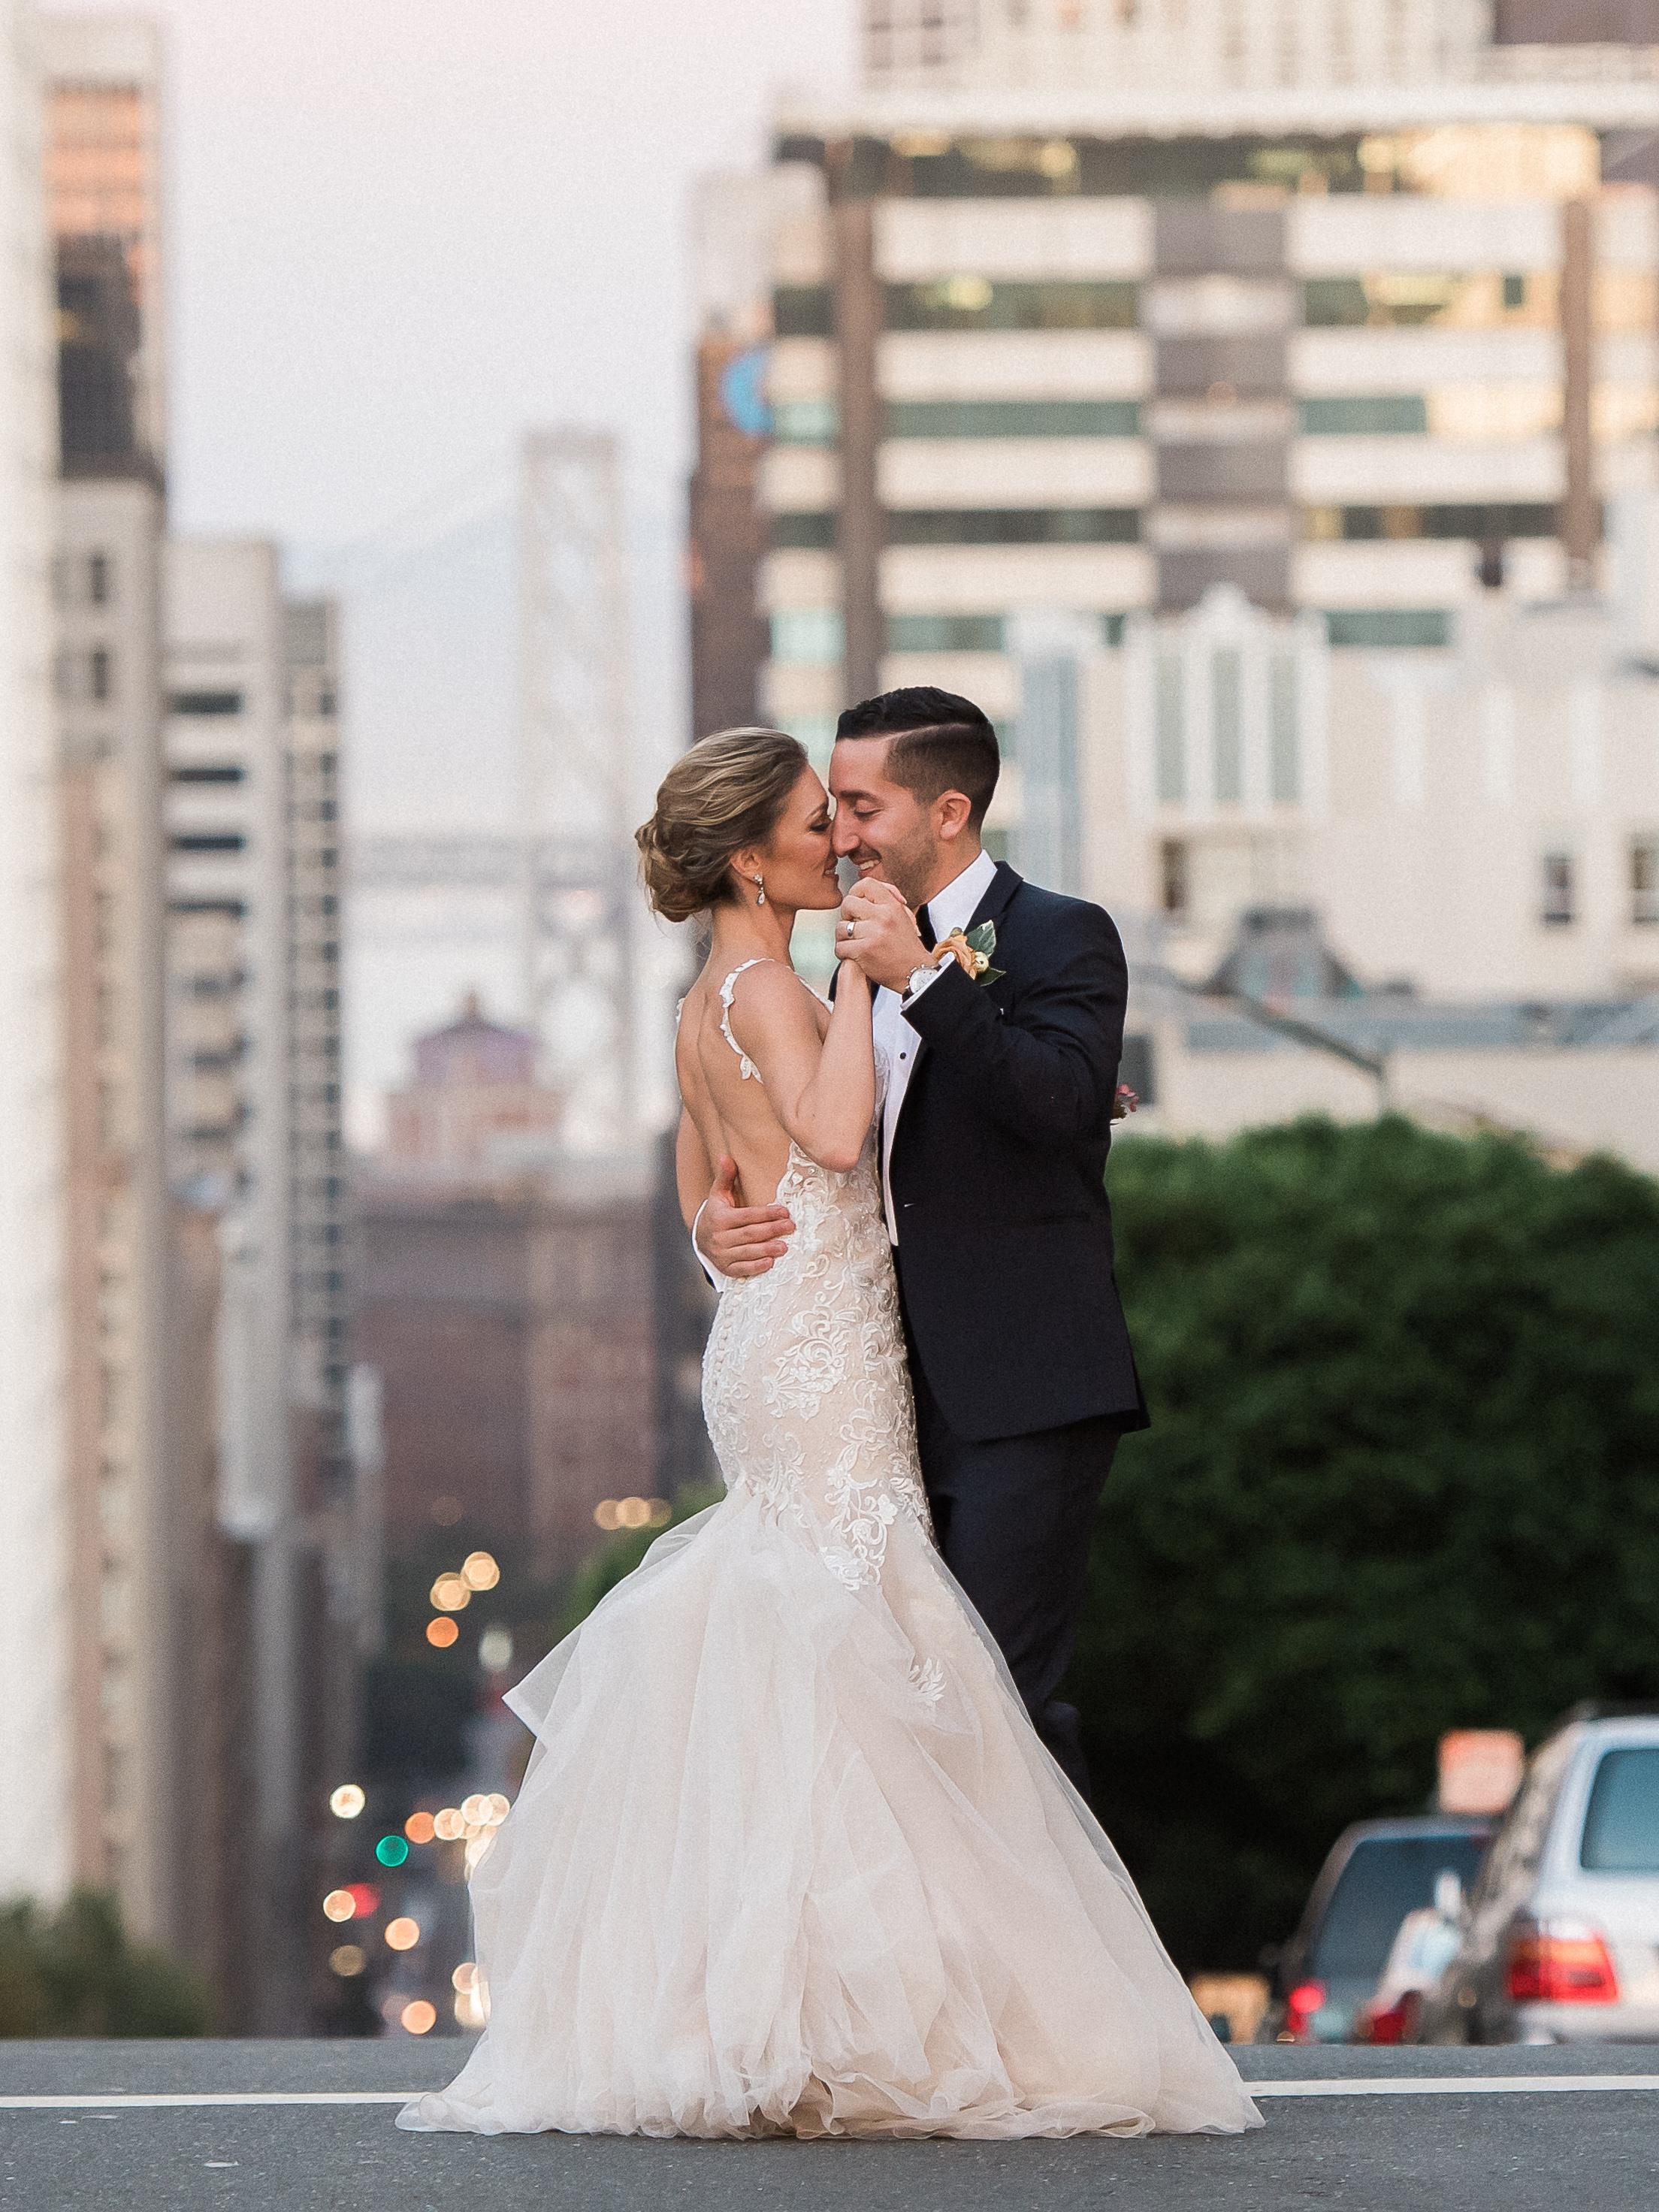 Katie+Nick_wedding_spp-blog-129.jpg